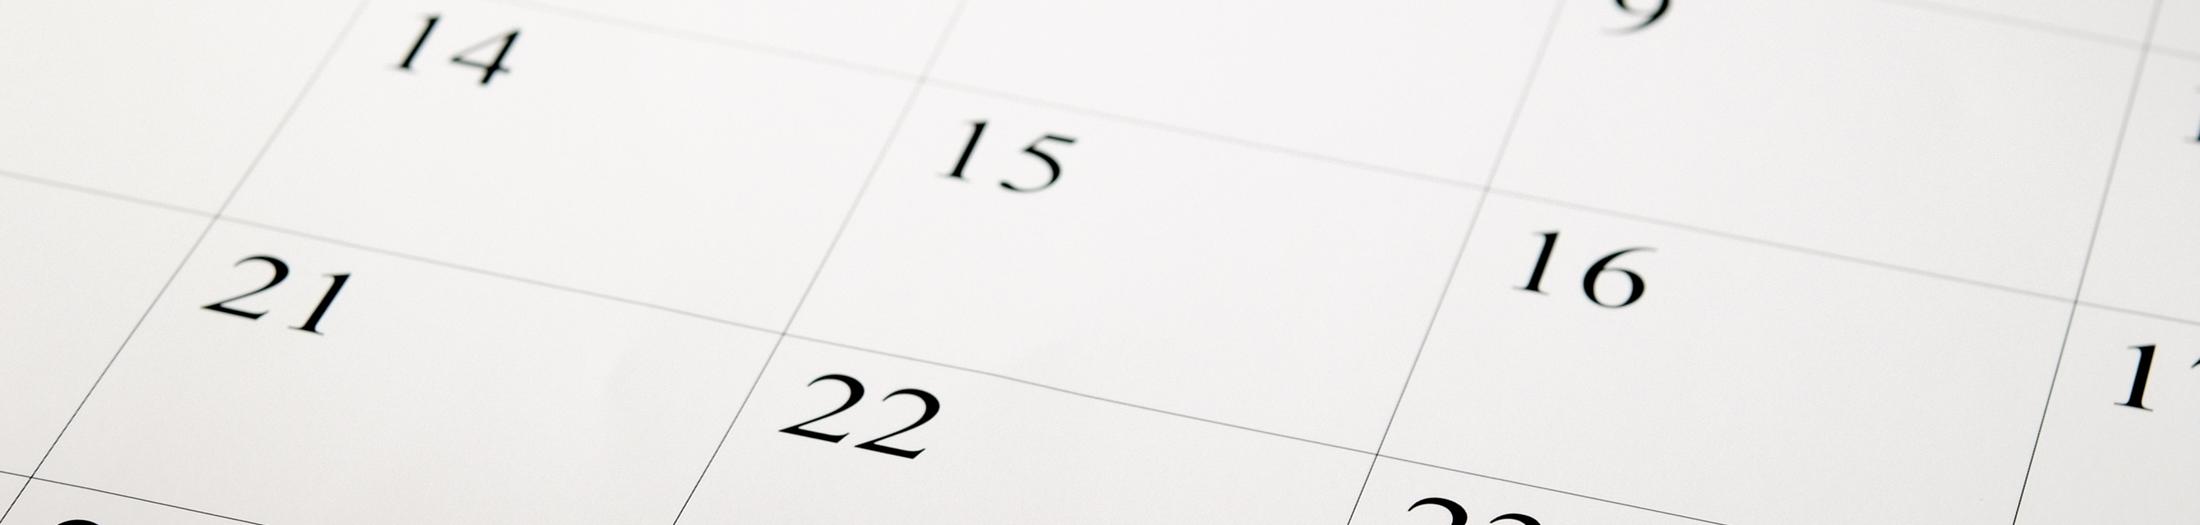 2021 Service Calendars